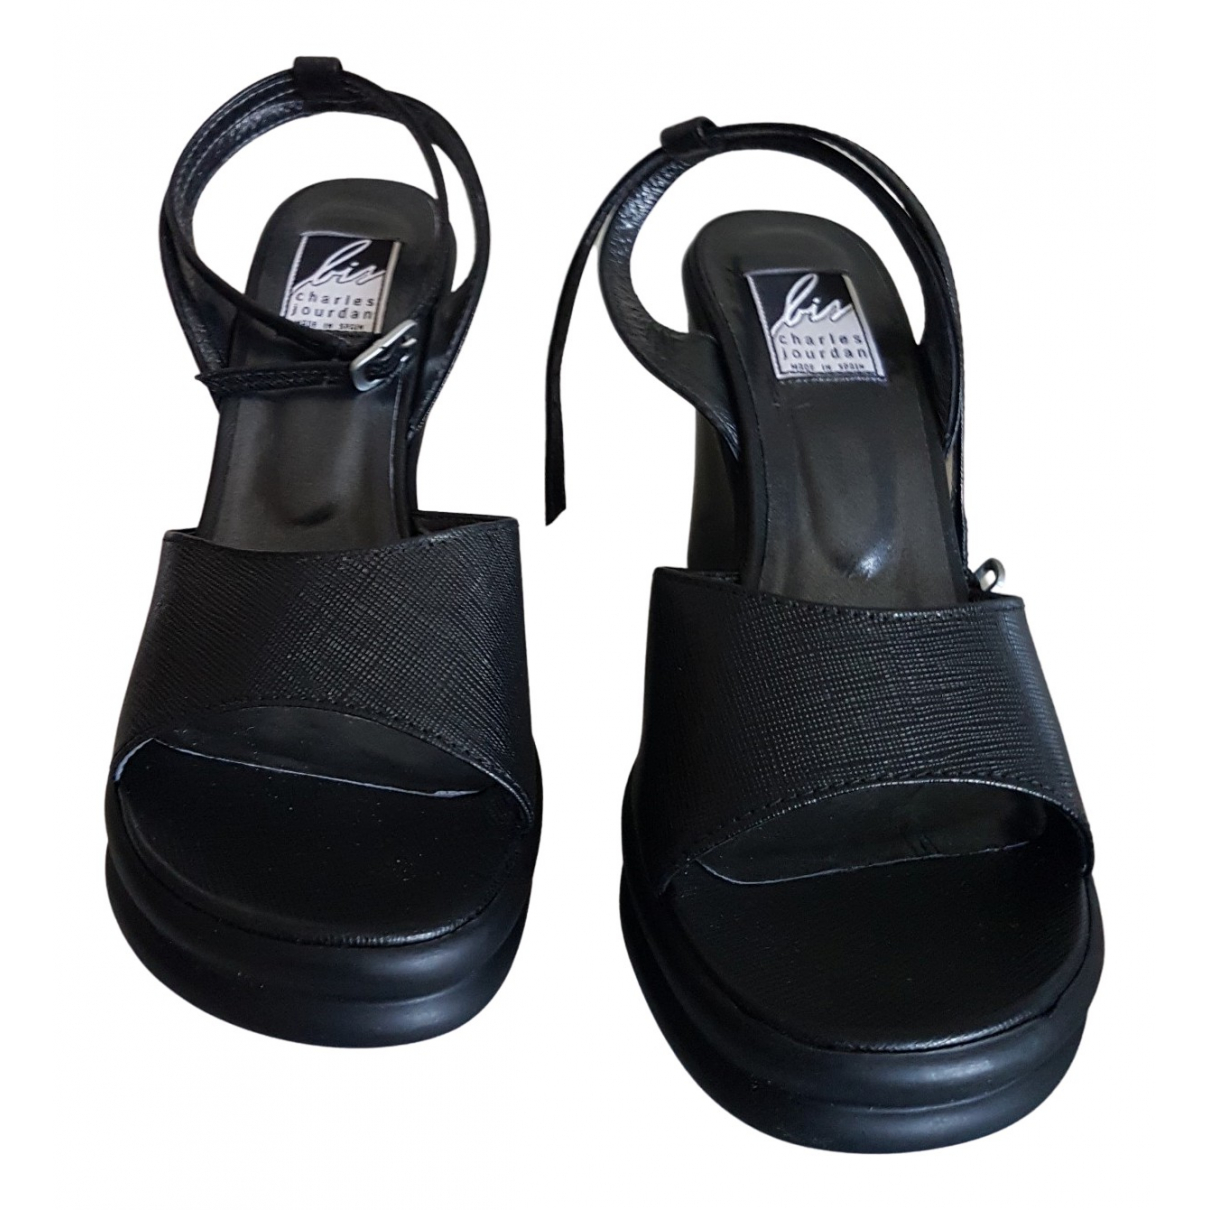 Charles Jourdan N Black Leather Heels for Women 37 EU